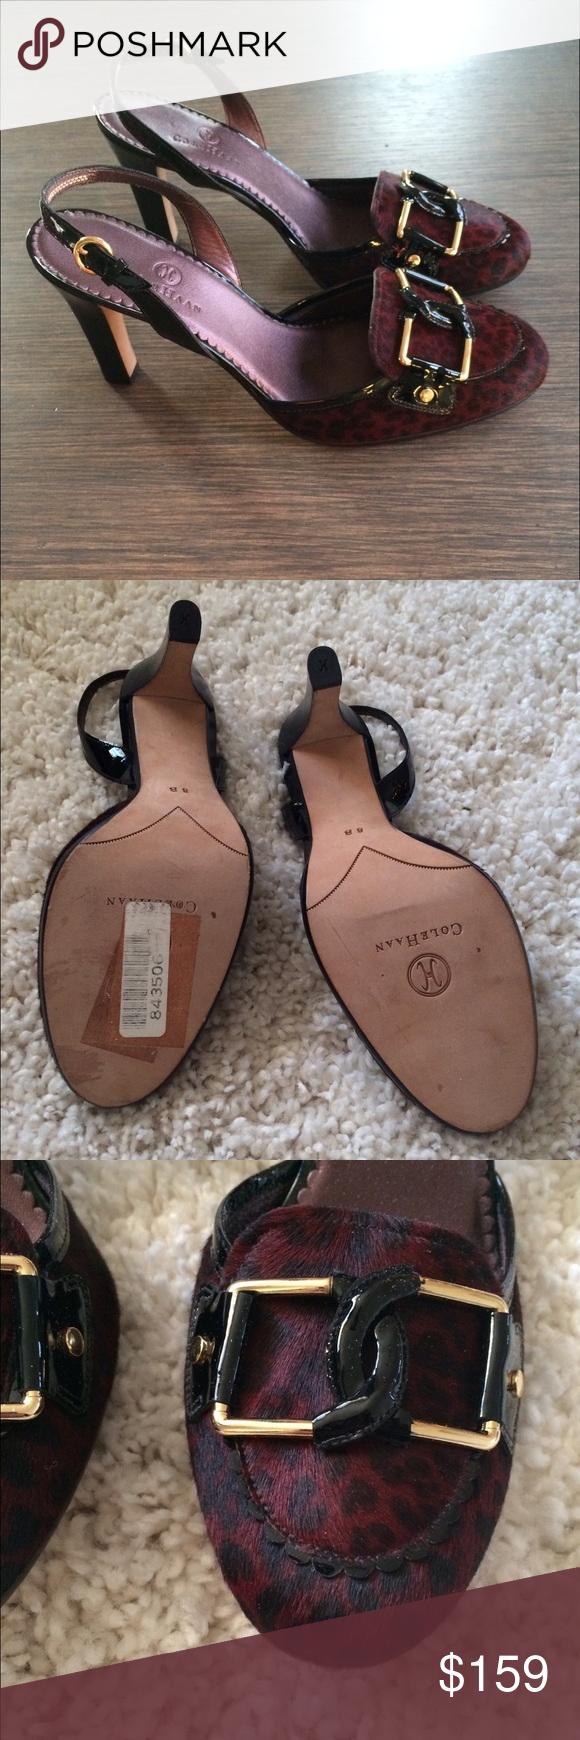 "COlE HAAN Maroon black Calf Hair Heels New, never worn. Has sticker in bottom sole. 3.75"" heel height. Maroon and black print calf hair. Sling back style. Cole Haan Shoes Heels"